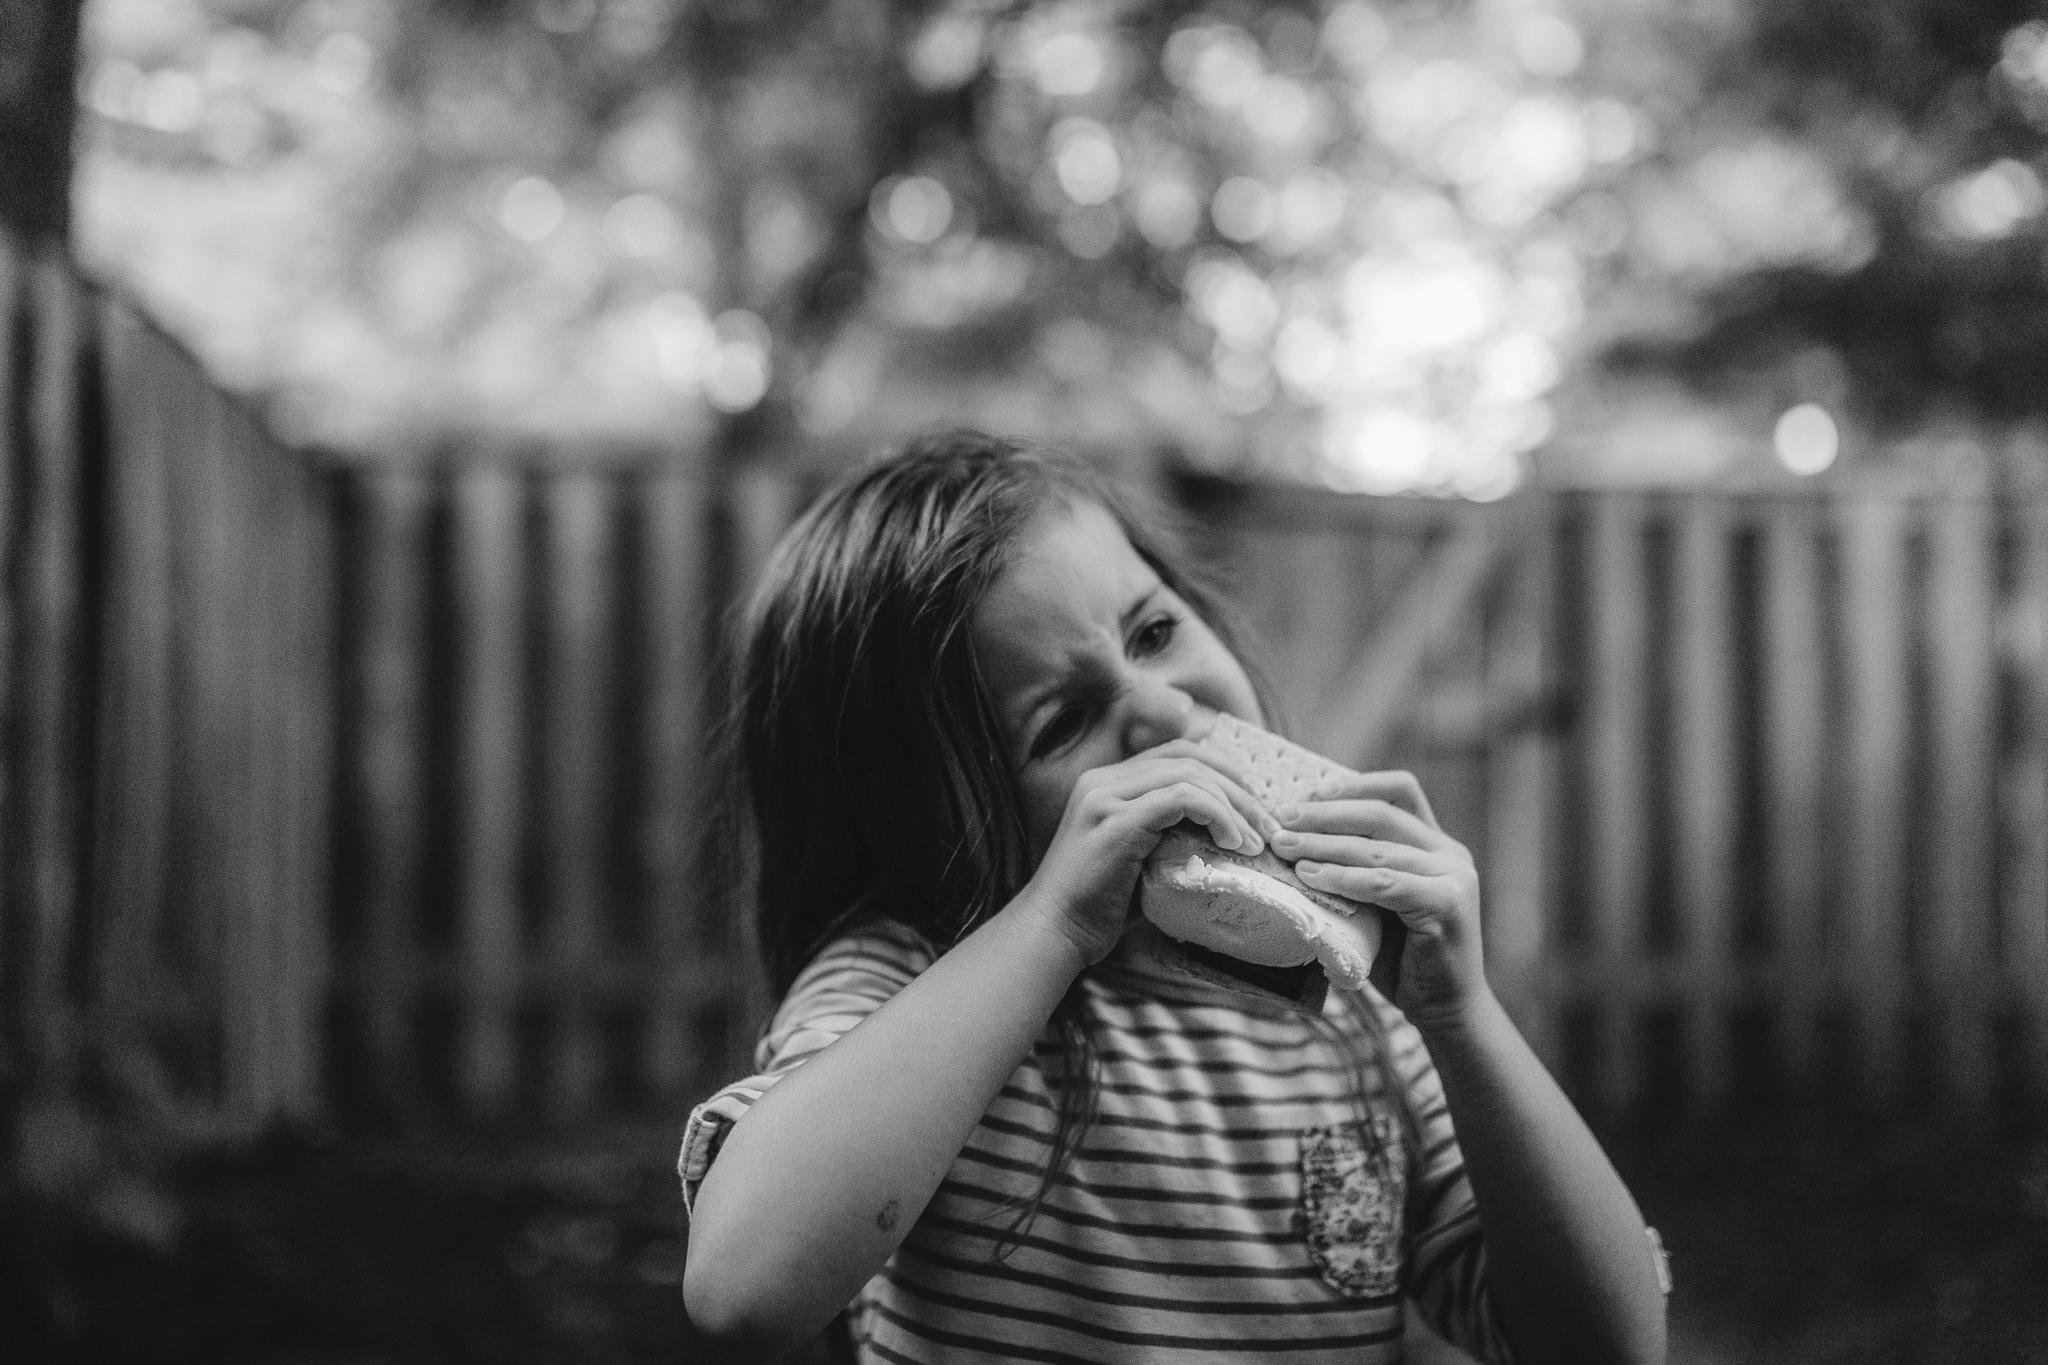 black and white girl eating smores summer Ashburn Loudoun Northern Virginia family lifestyle documentary childhood Marti Austin Photography